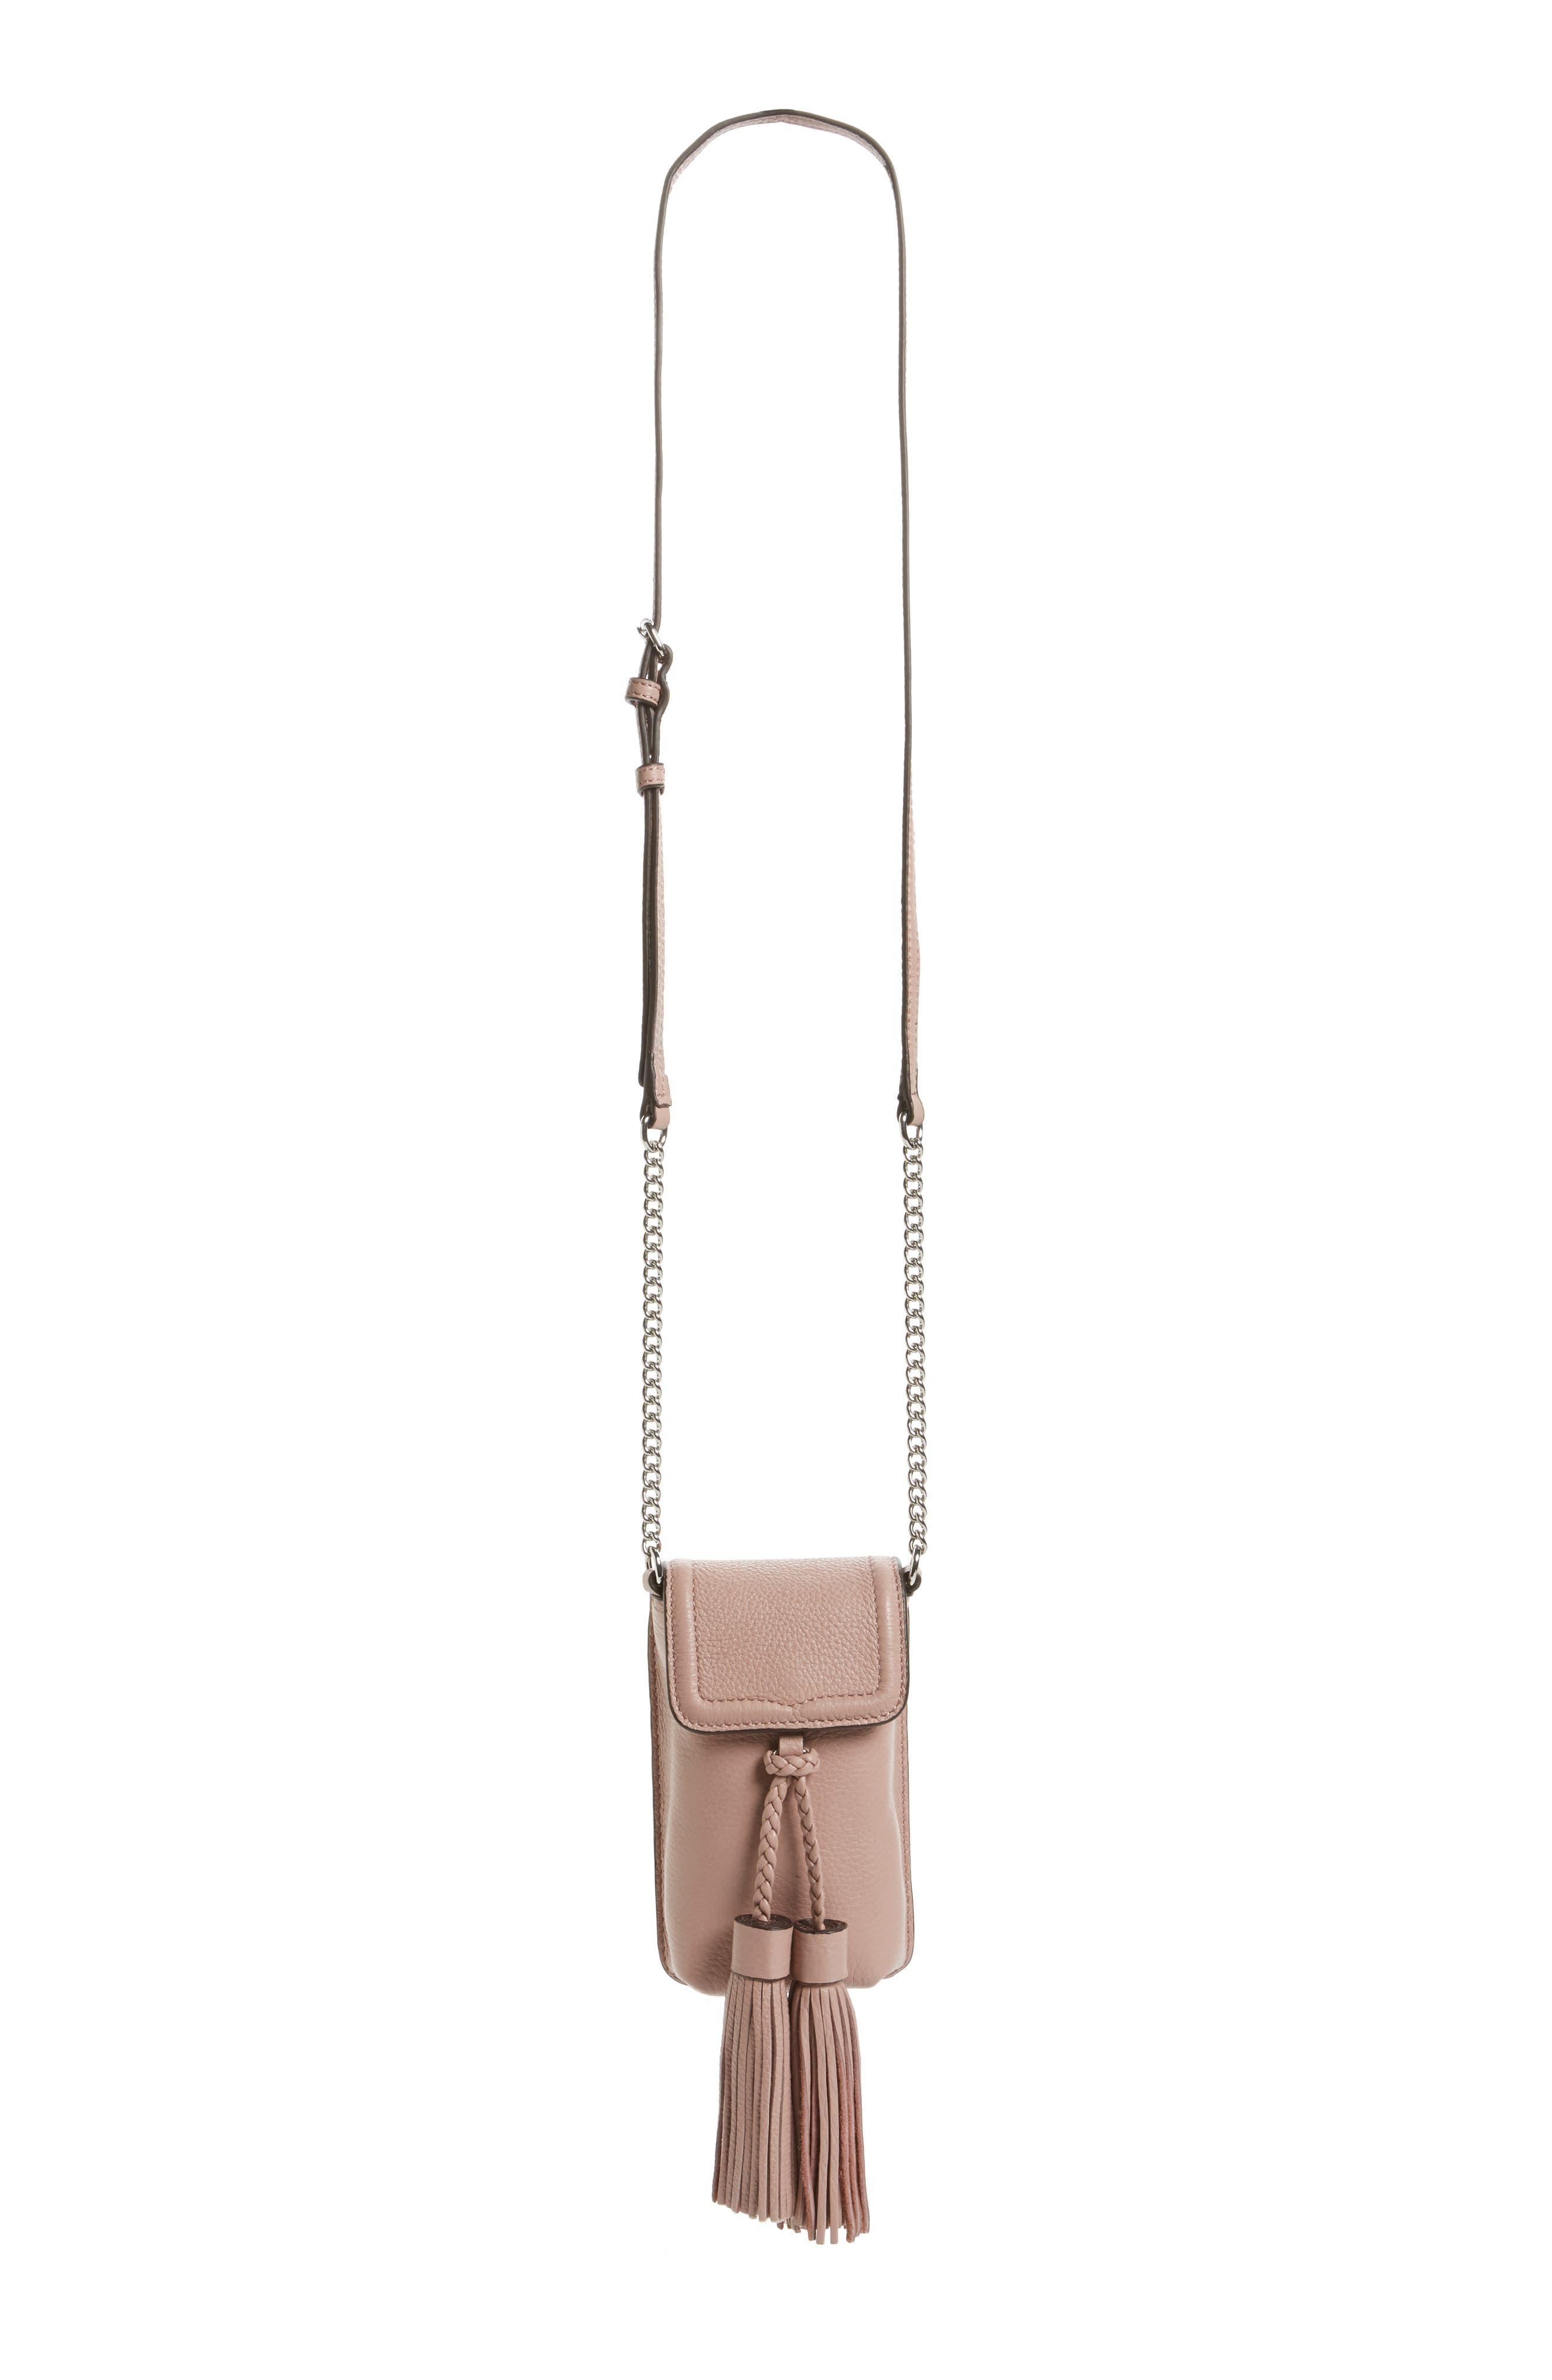 REBECCA MINKOFF Isobel Smartphone Crossbody Bag